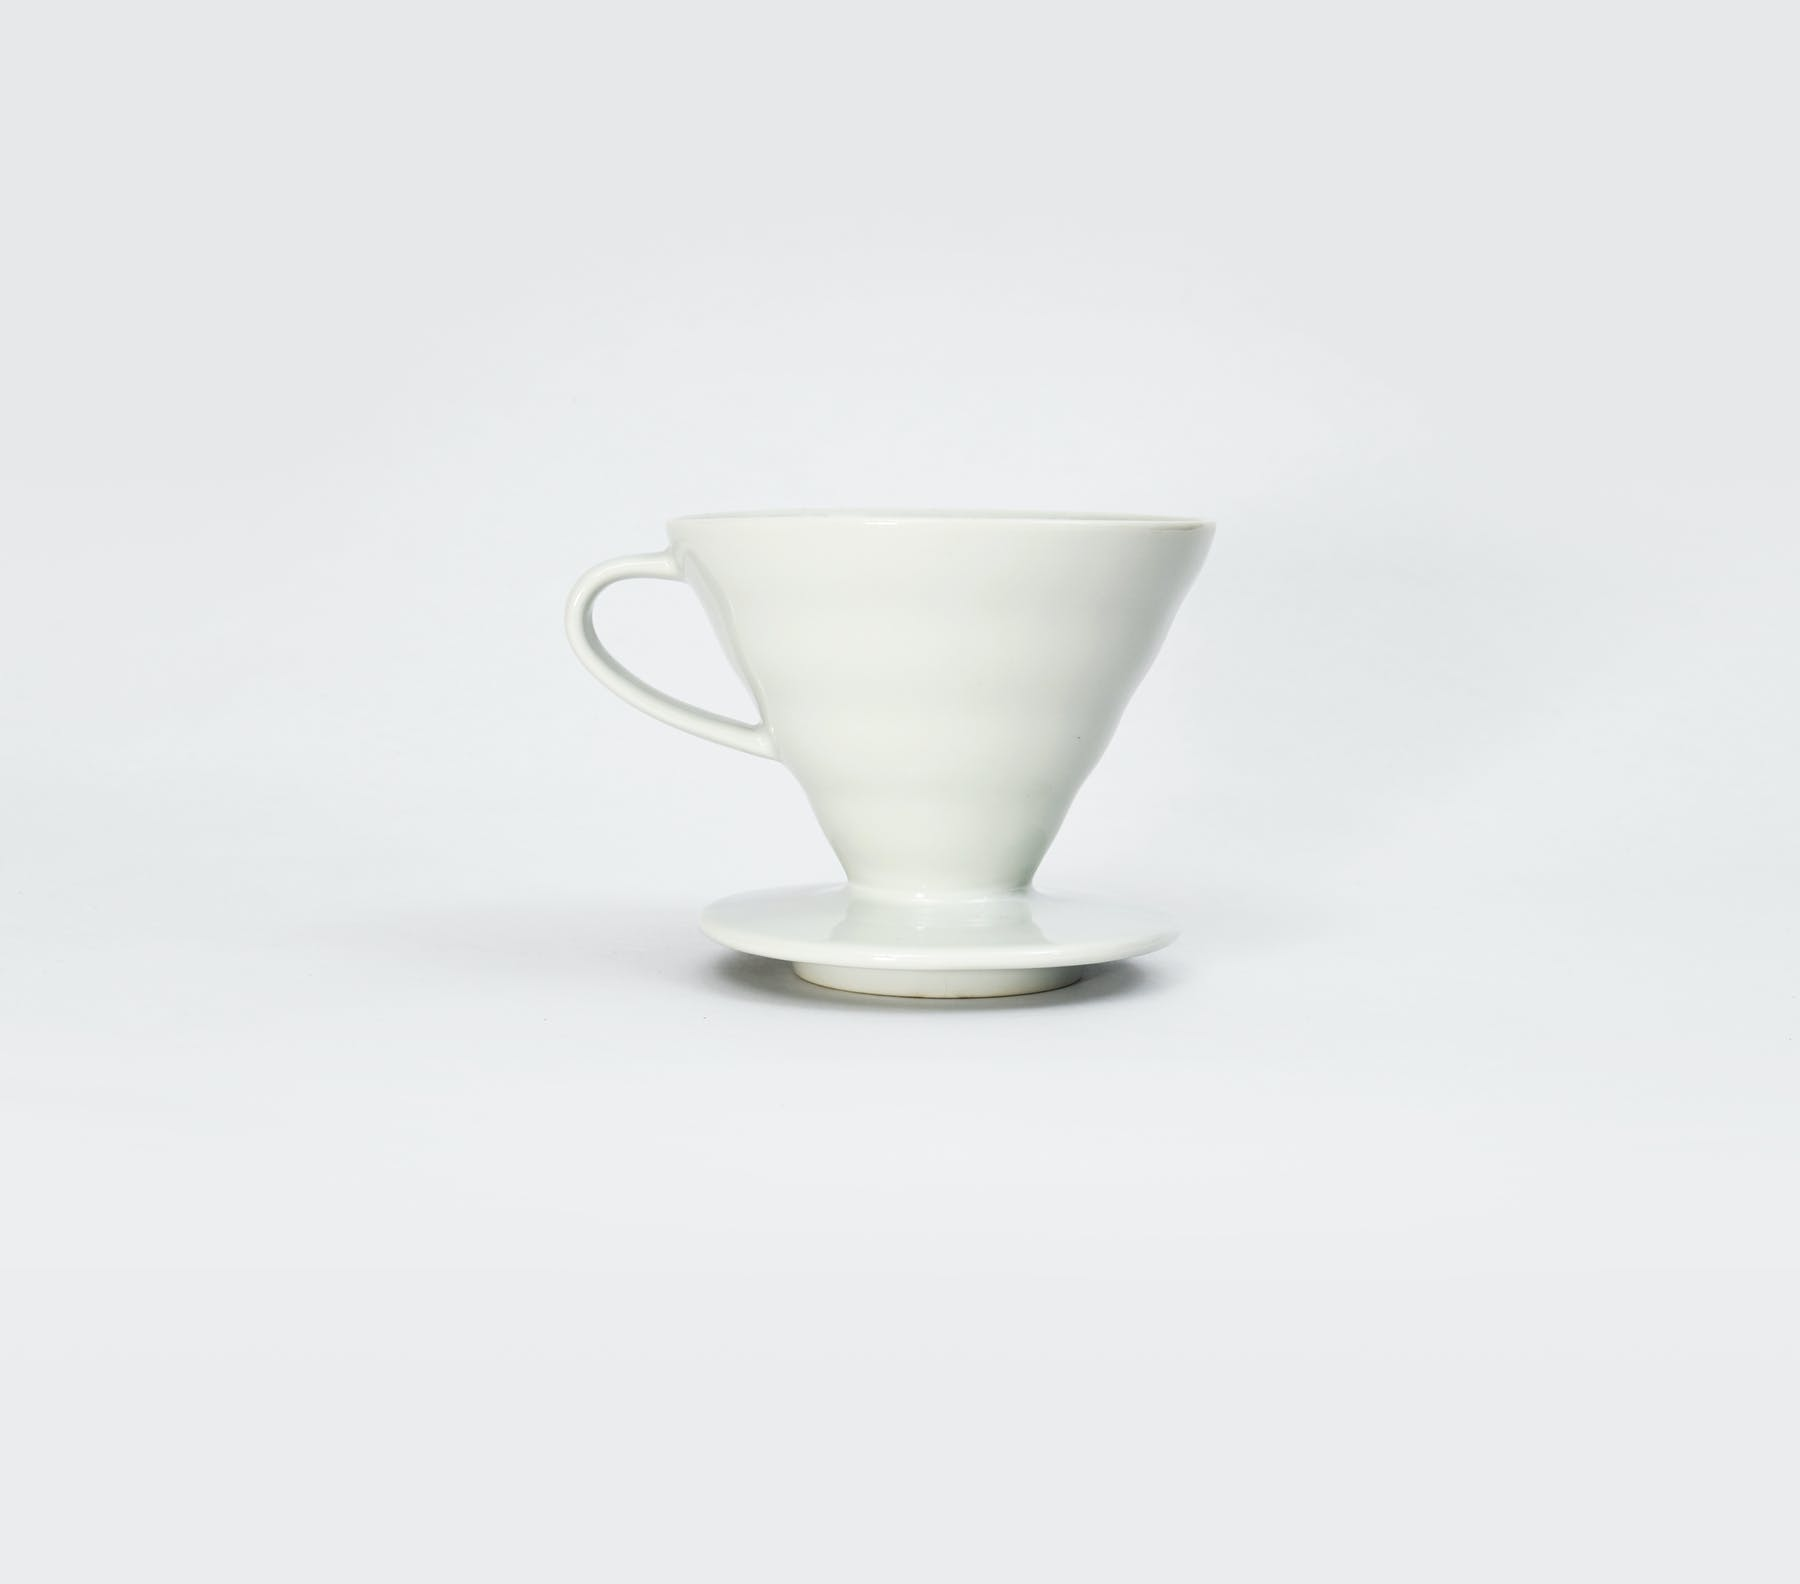 dispatch coffee V60 ceramic 01 b